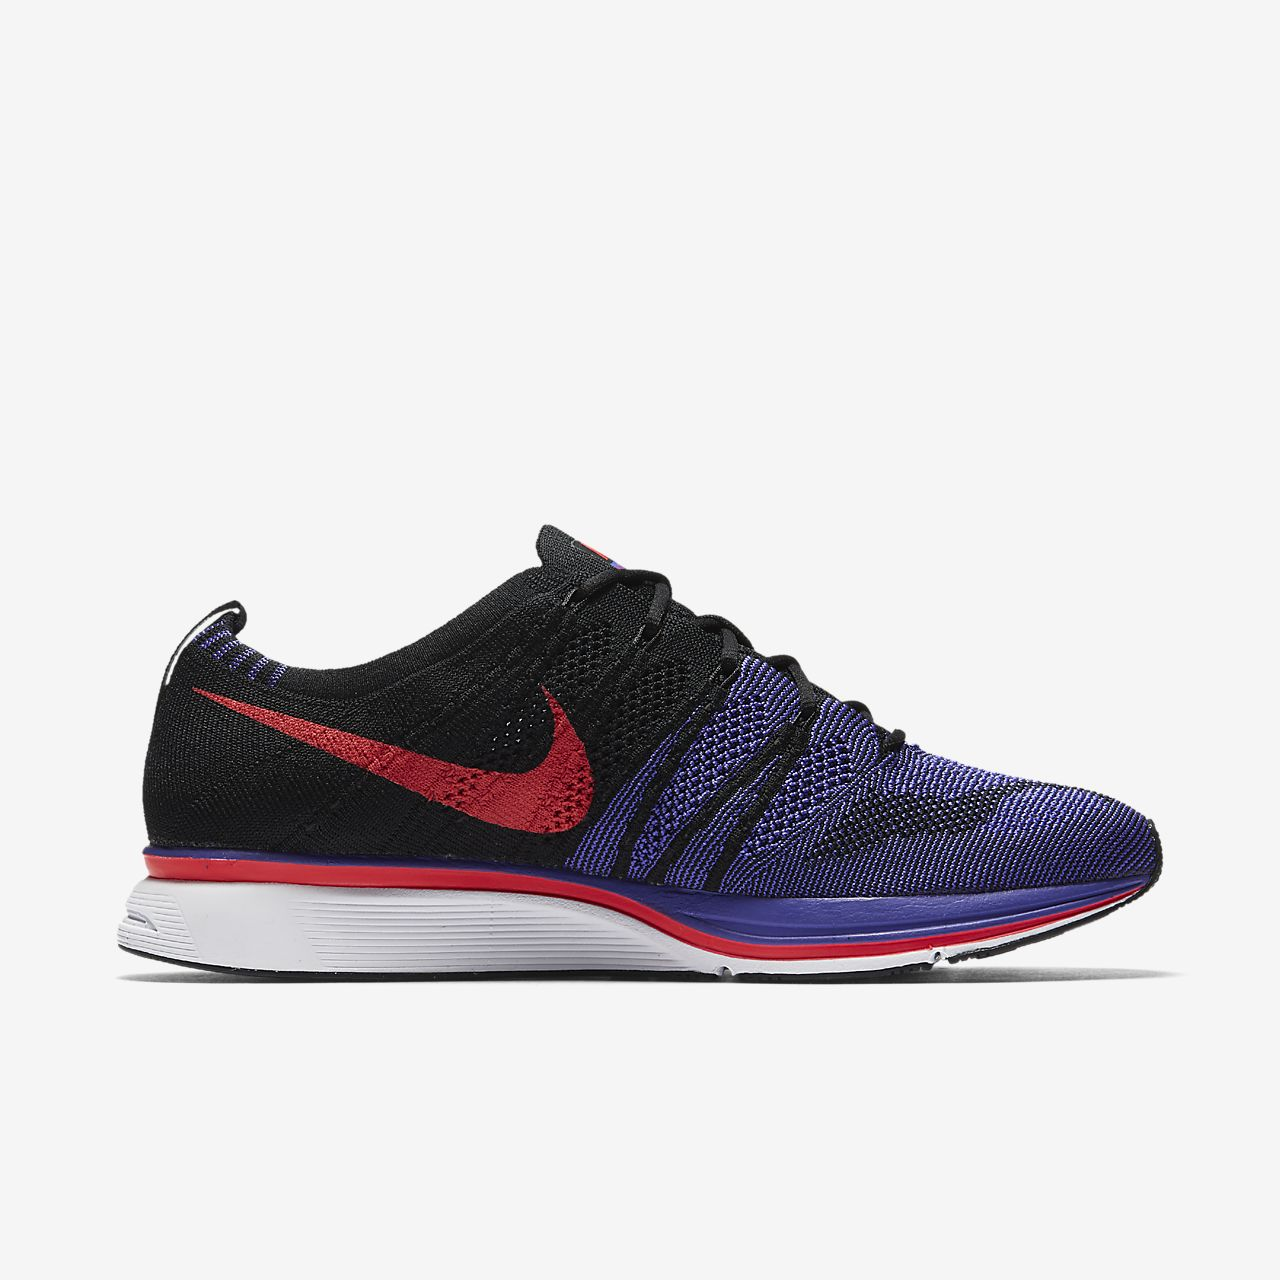 Nike Chaussure Mixte Chaussure Mixte Nike TrainerBe Flyknit TlFK1cJ